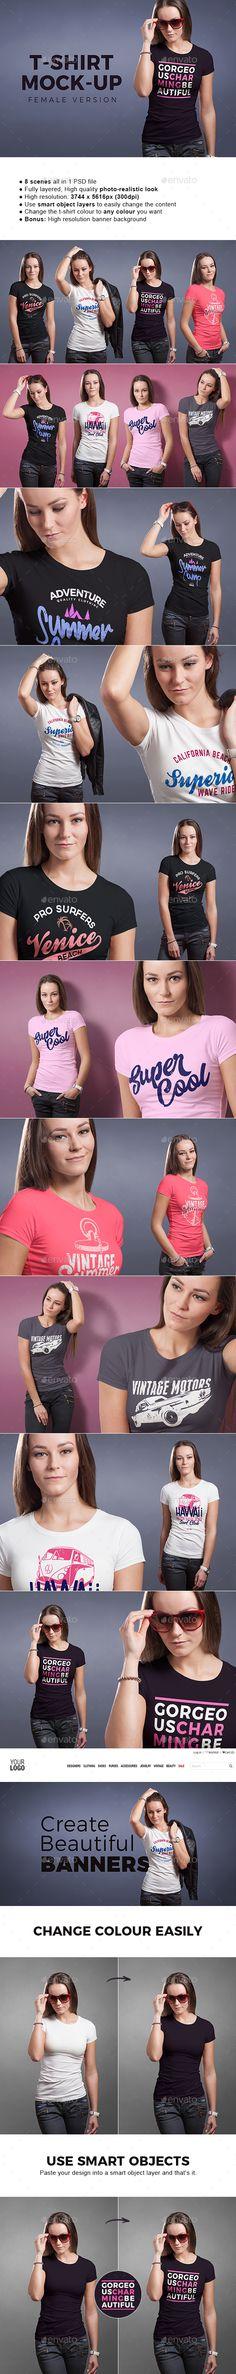 Female T-shirt Mocku